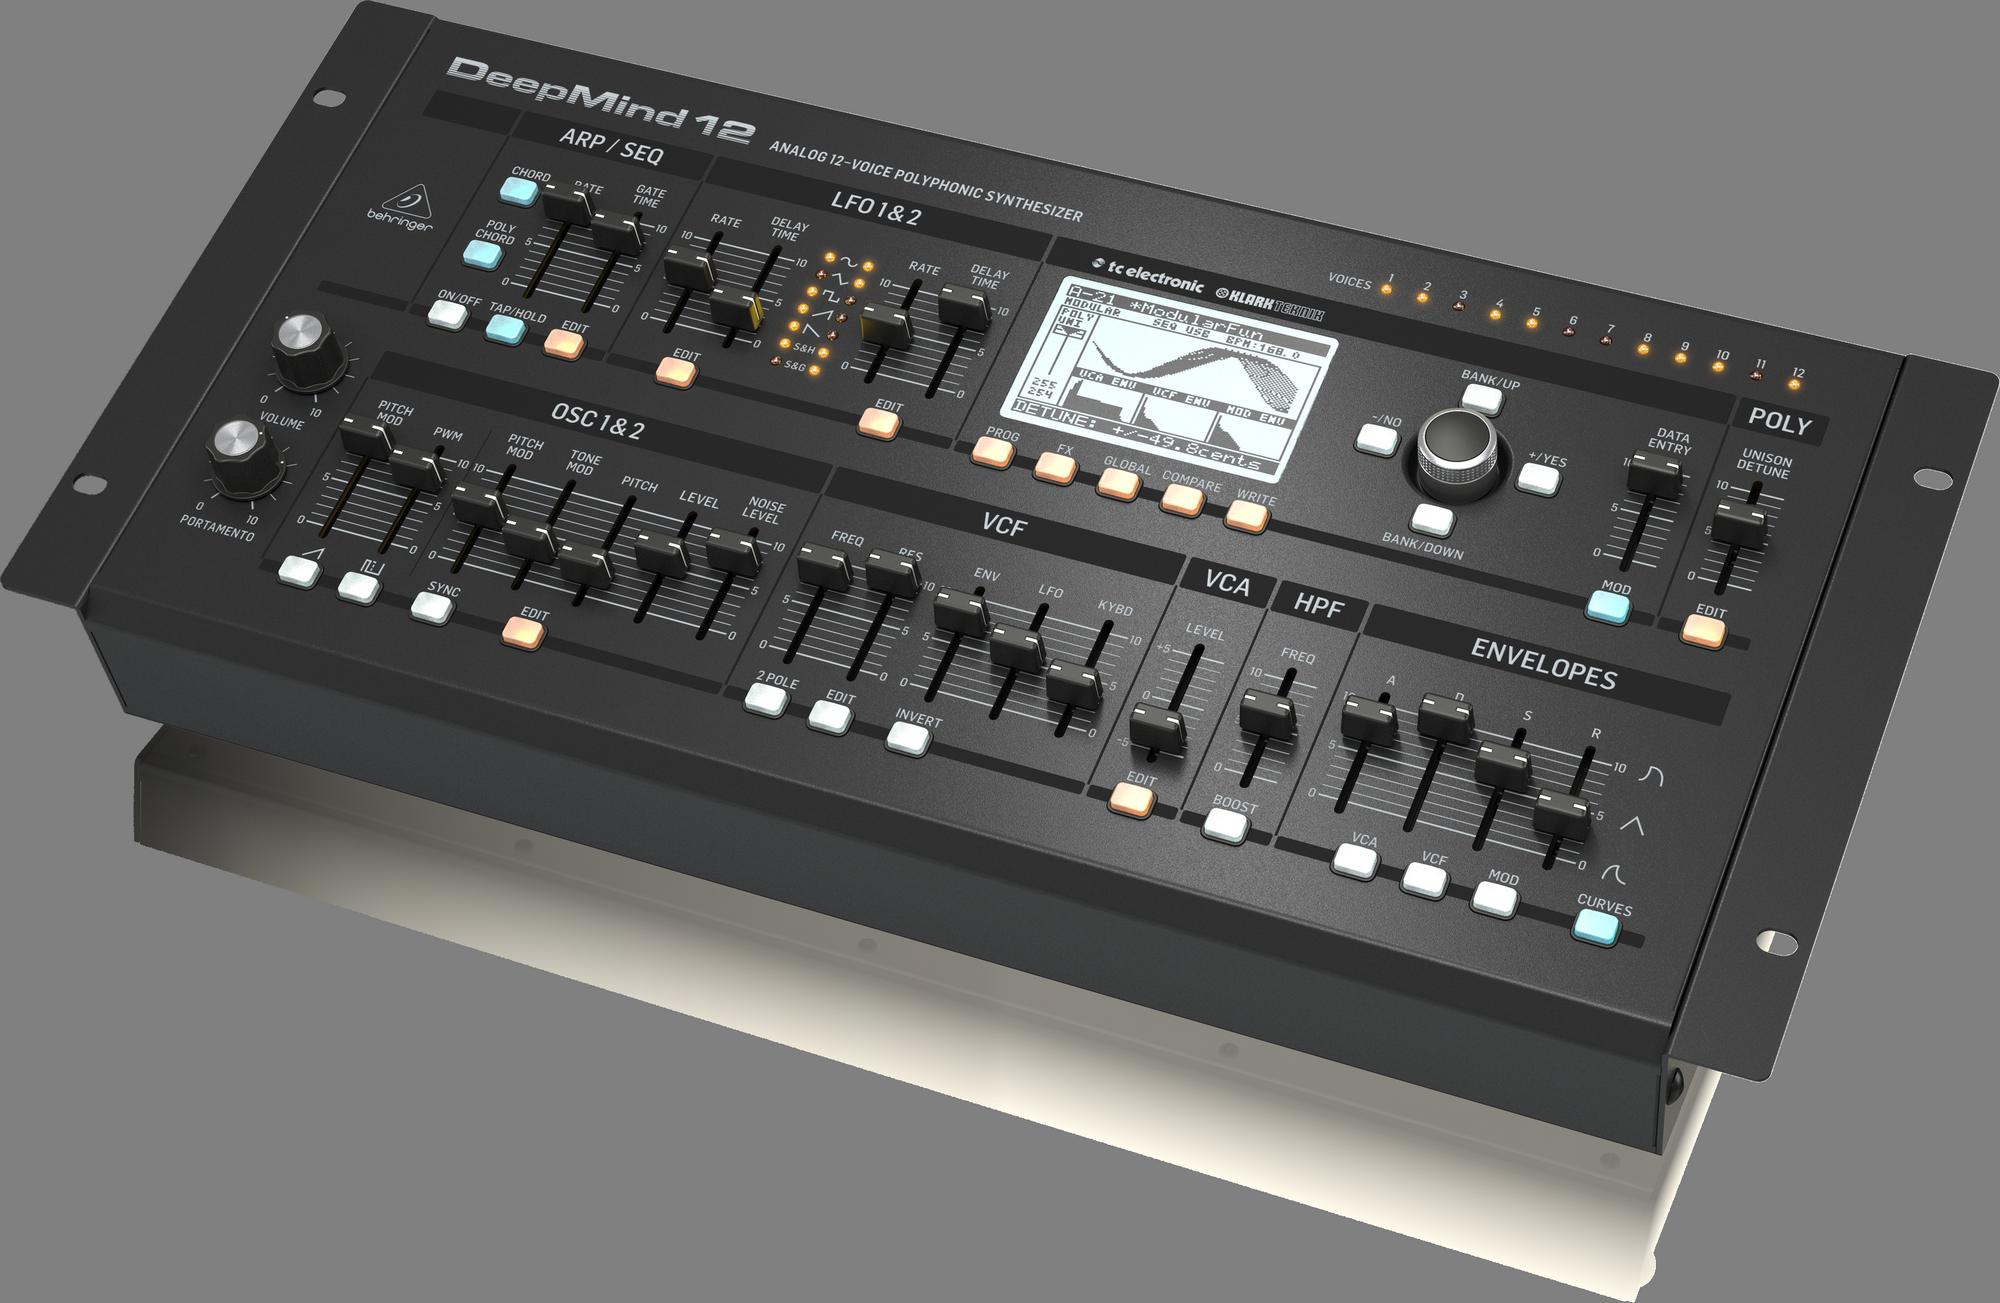 Behringer DeepMind 12D - Analog synthesizer